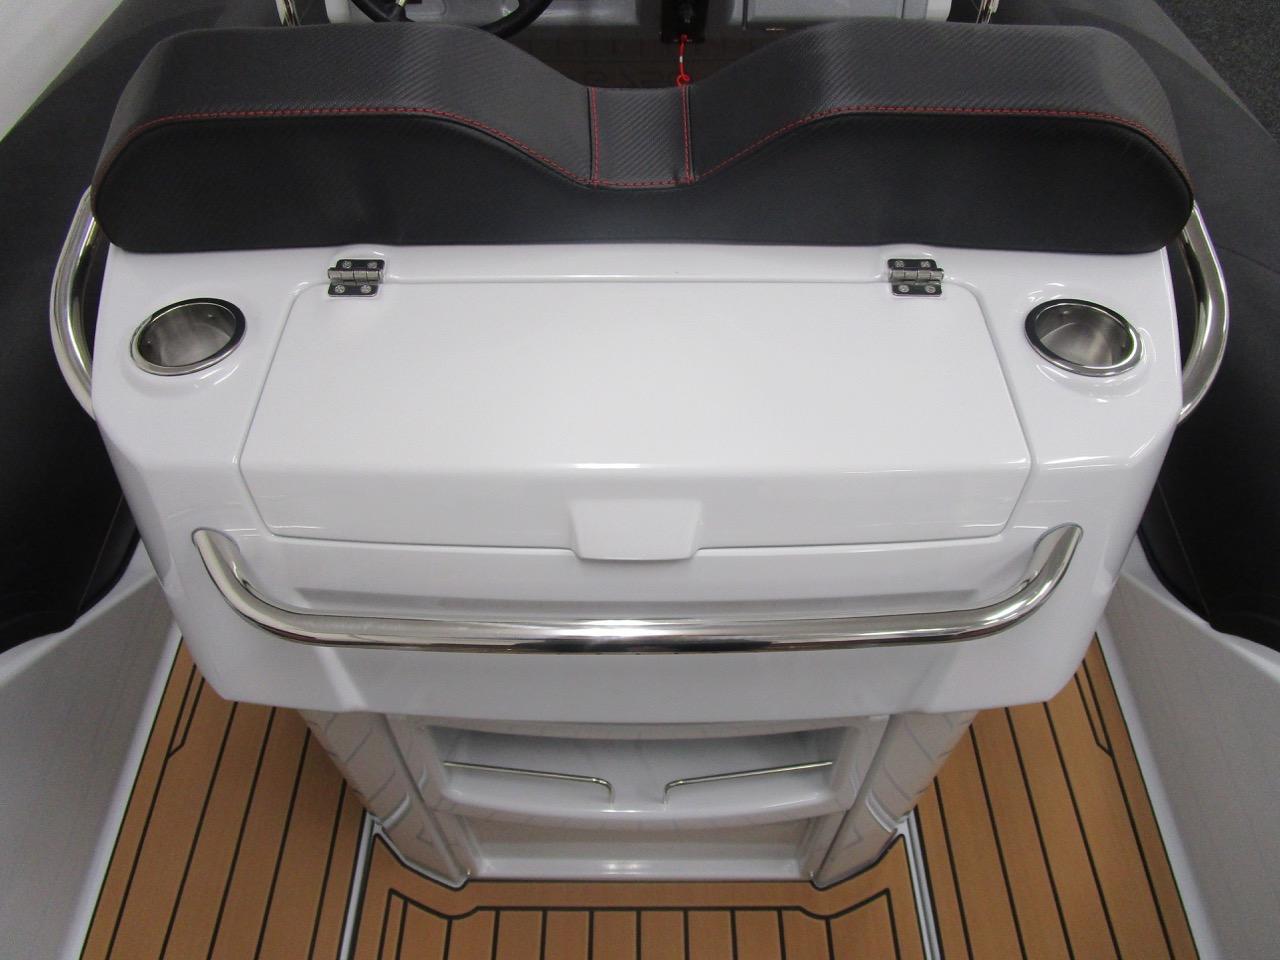 GRAND G750 RIB helm seat top